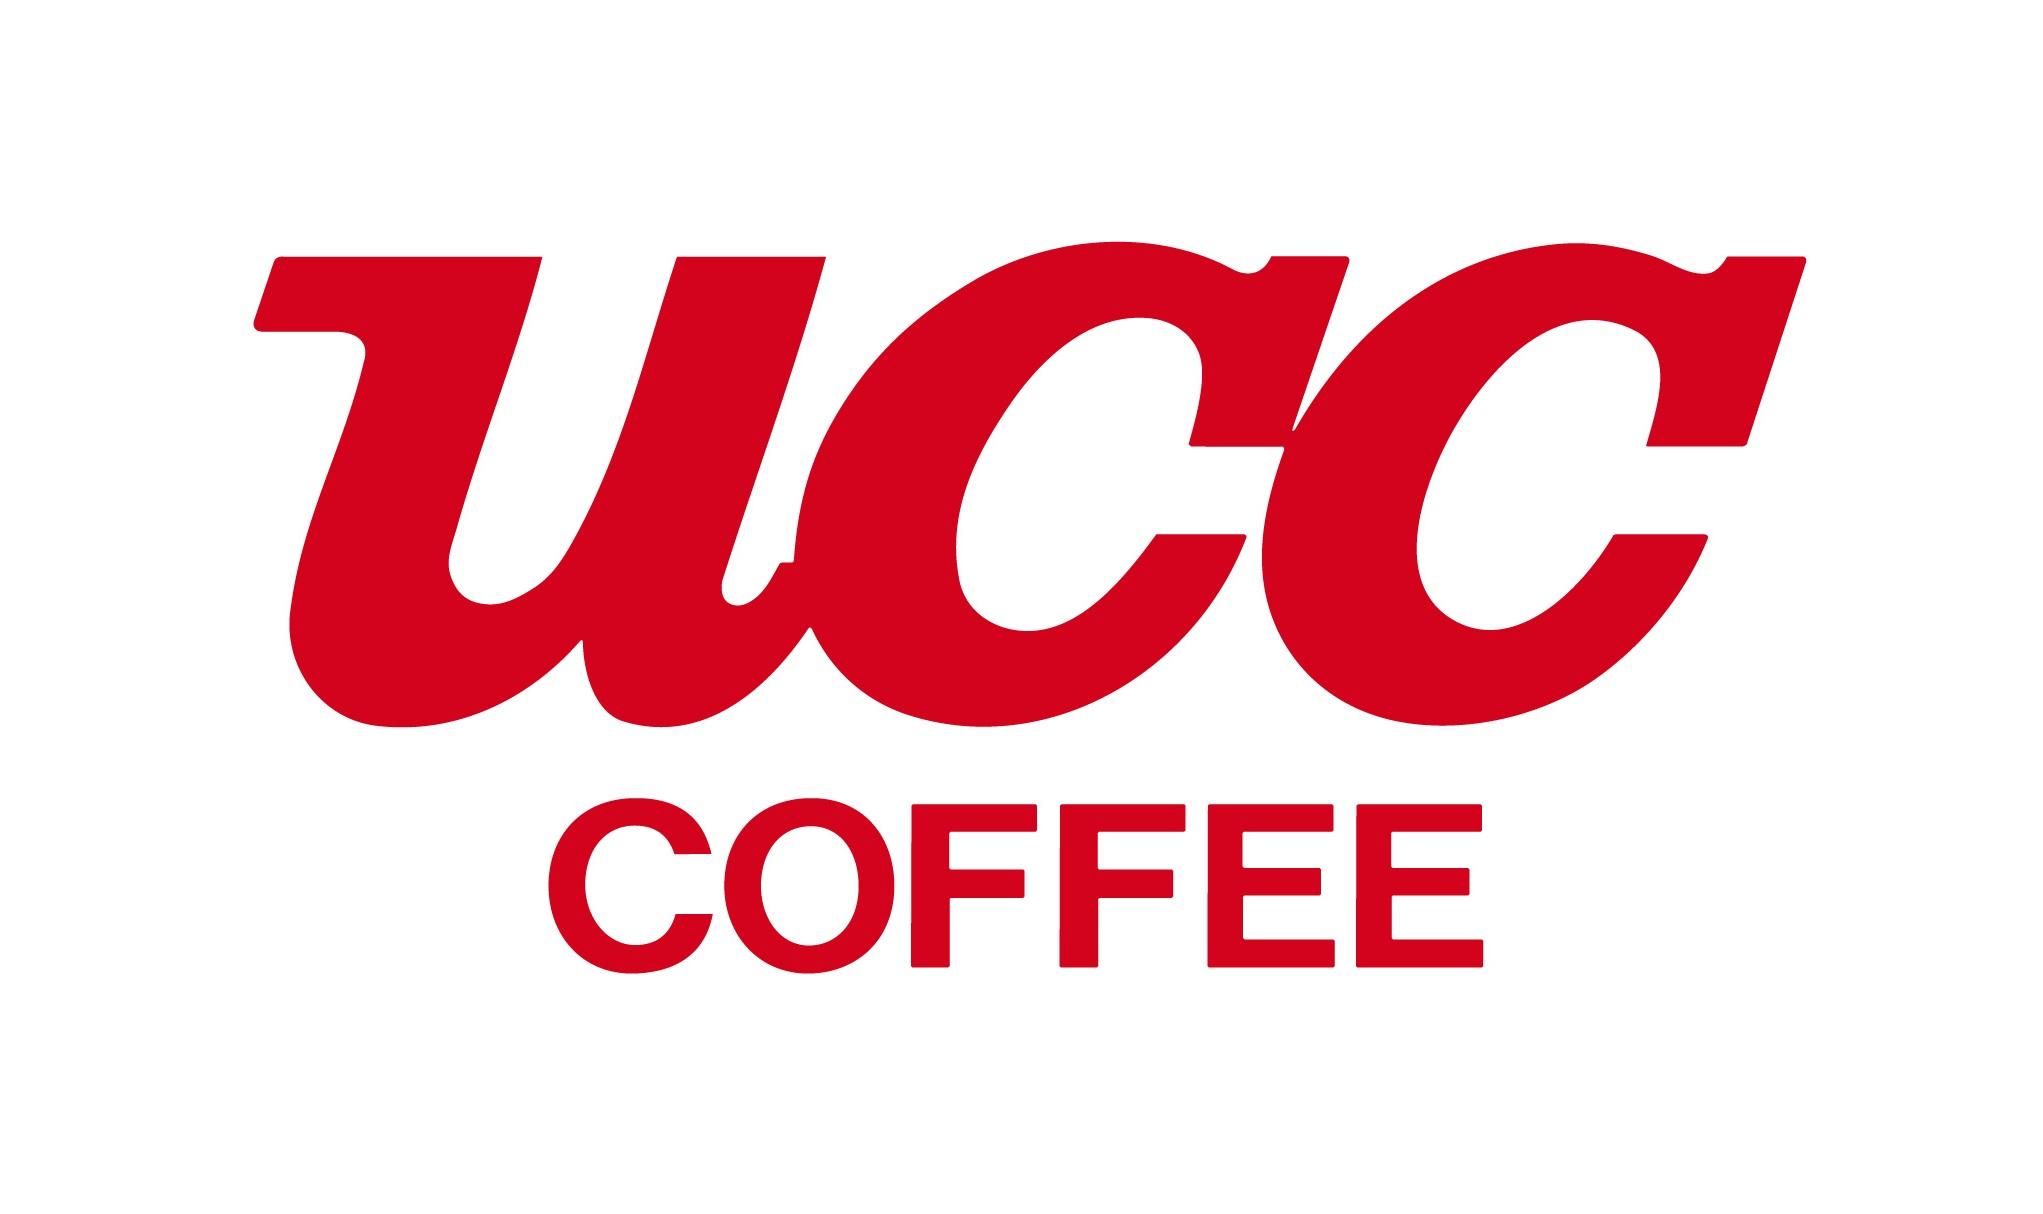 UCC Coffe